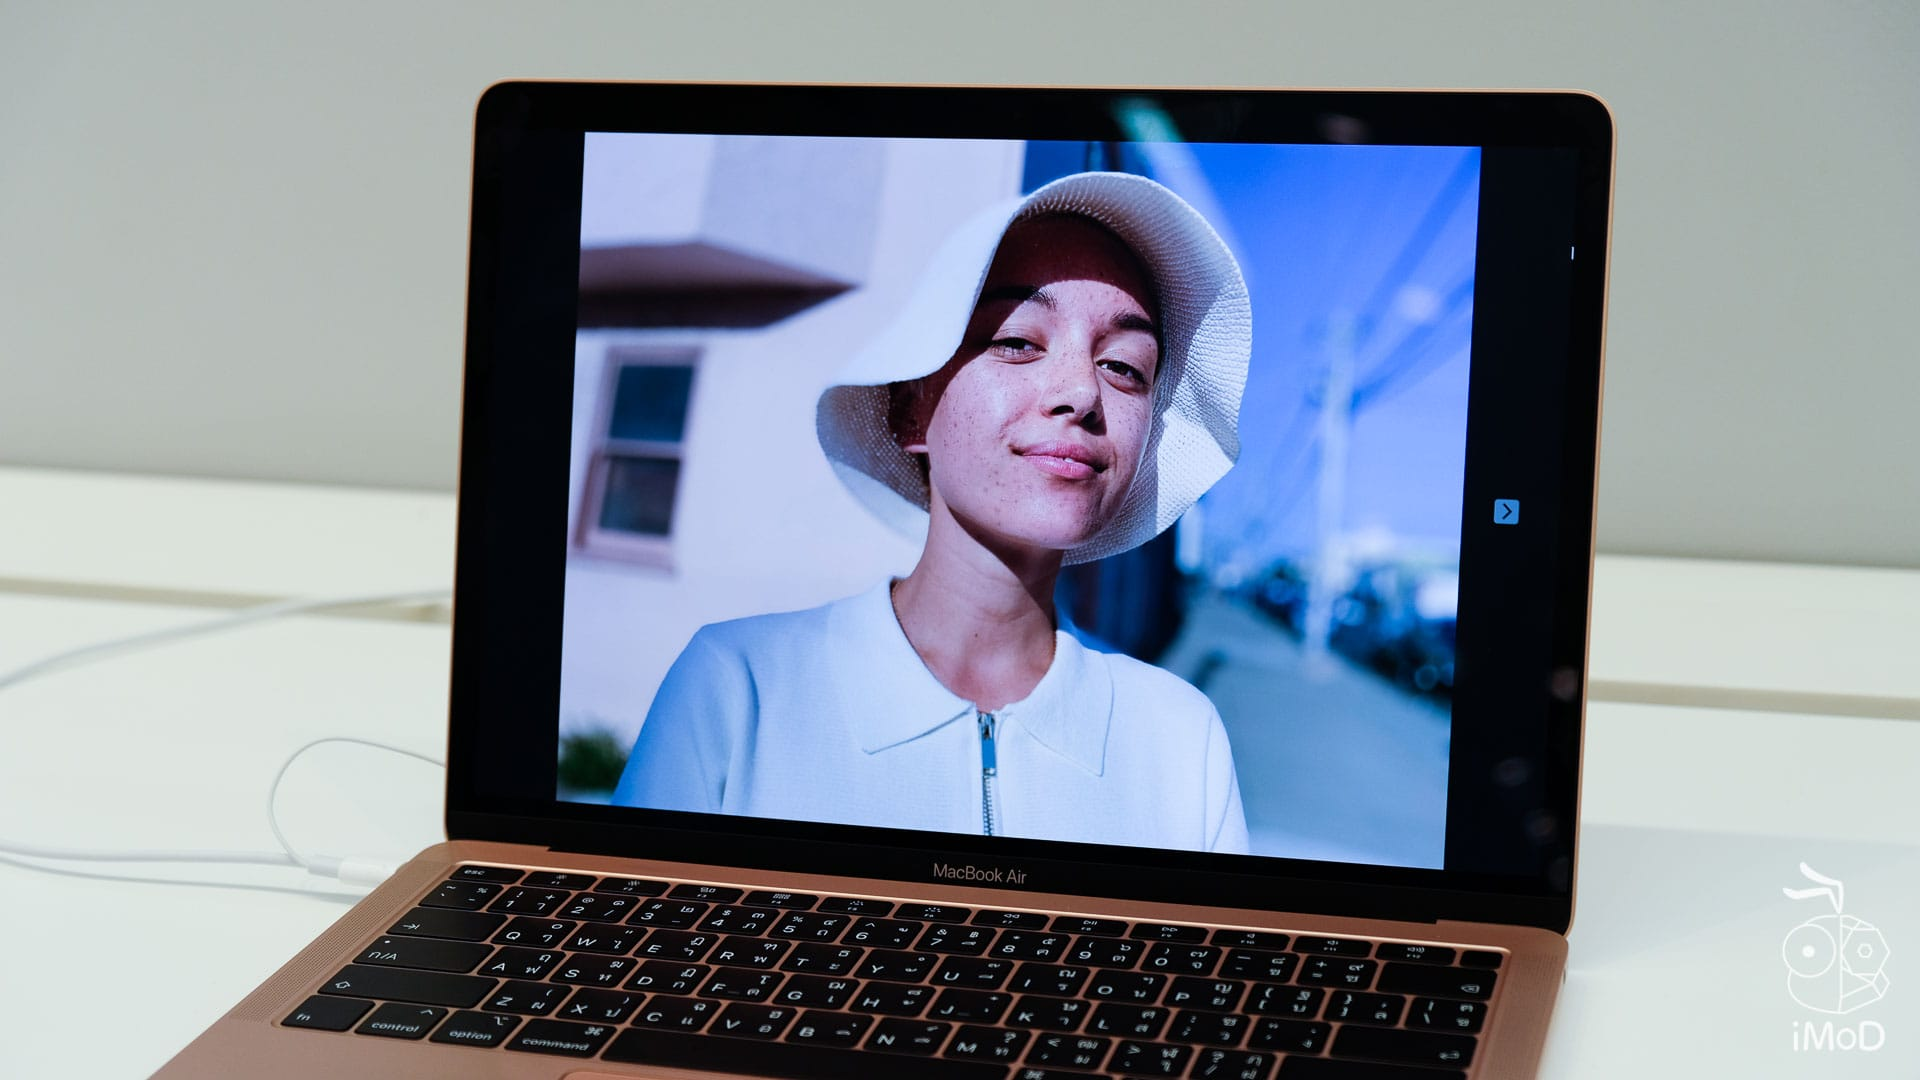 Ipad Pro Macbook Air 2018 Studio7 2385